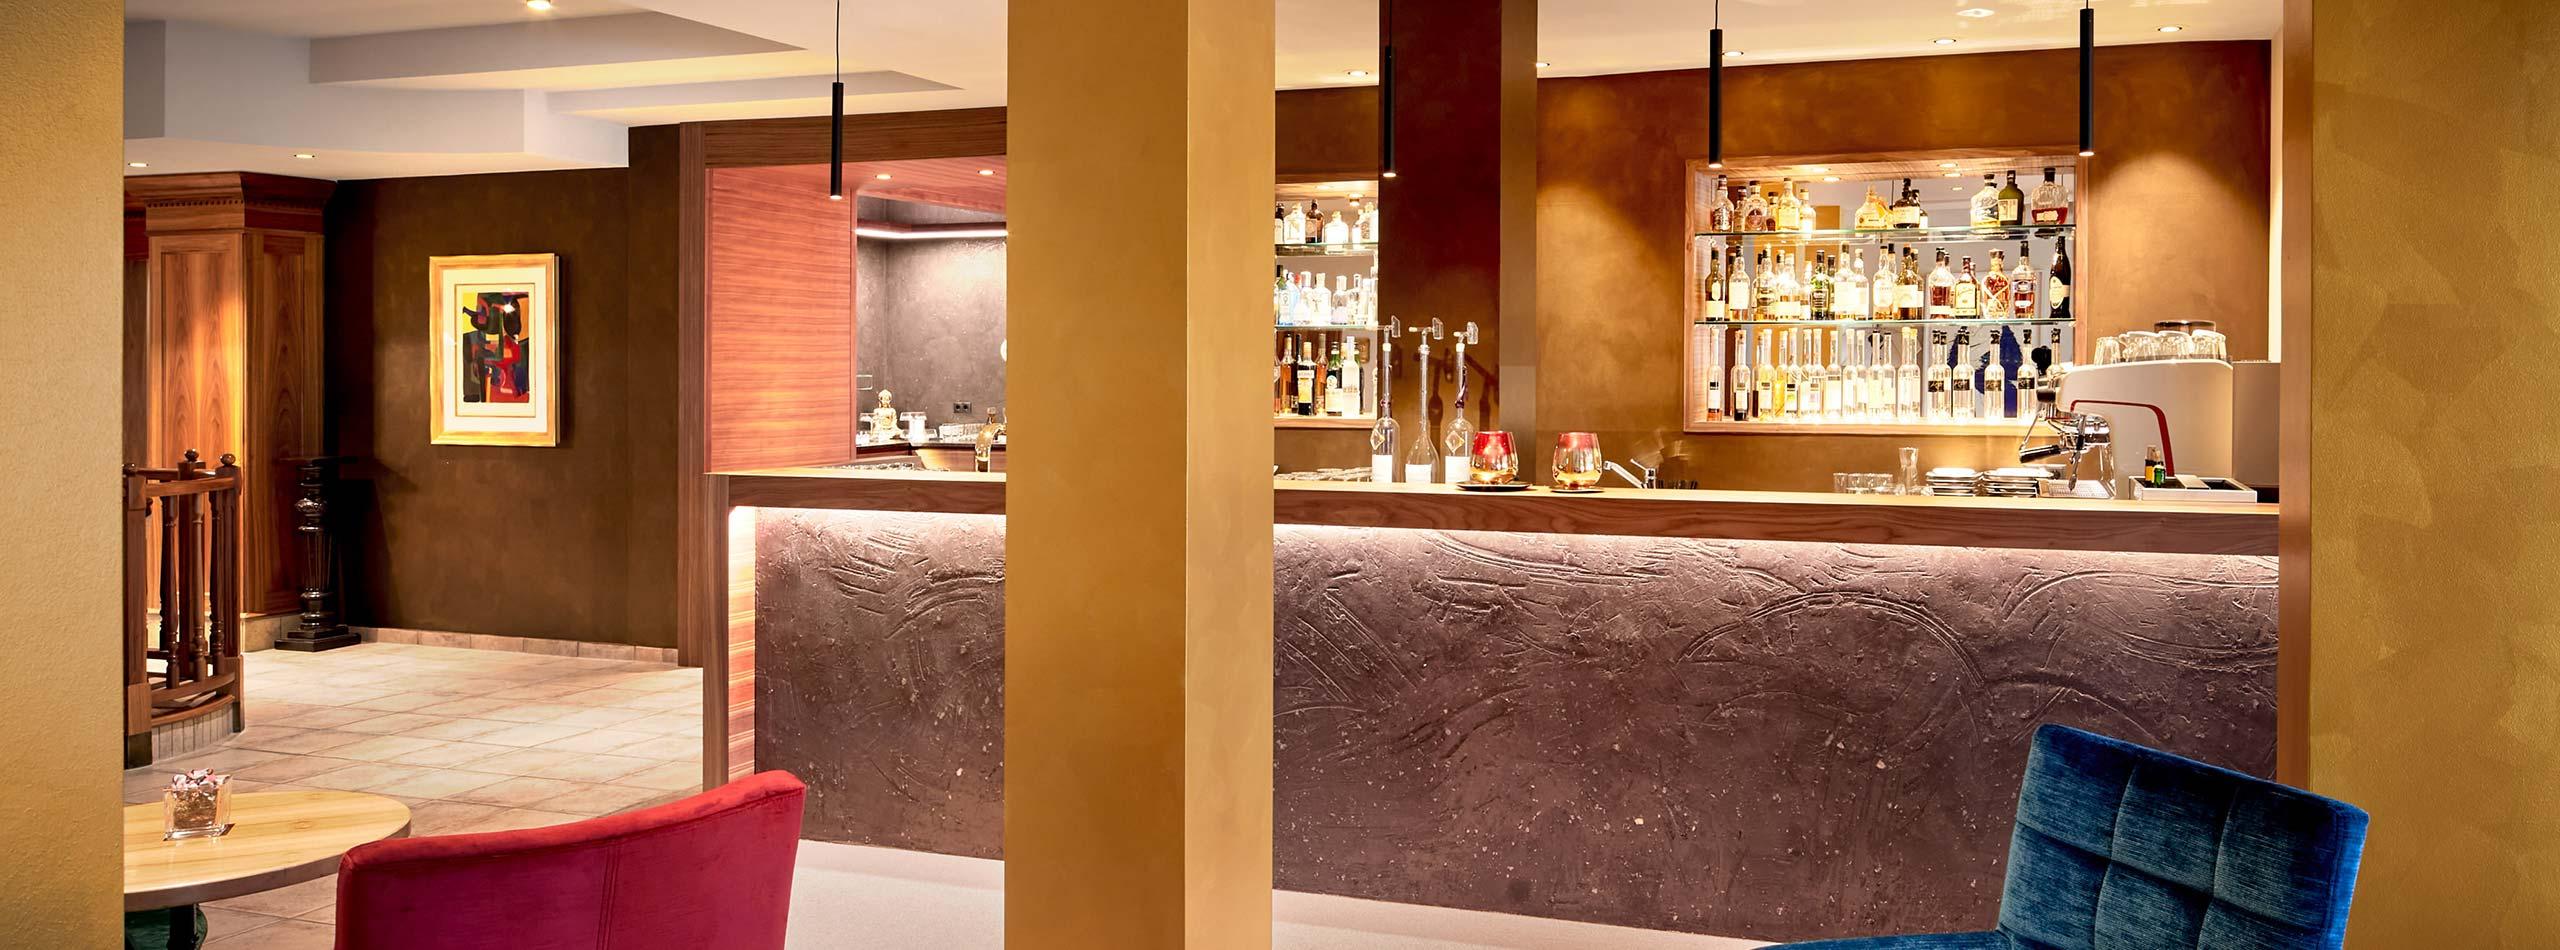 Bar-Lounge-Ayurveda-Spa-Bad-Waltersdorf-Steiermark